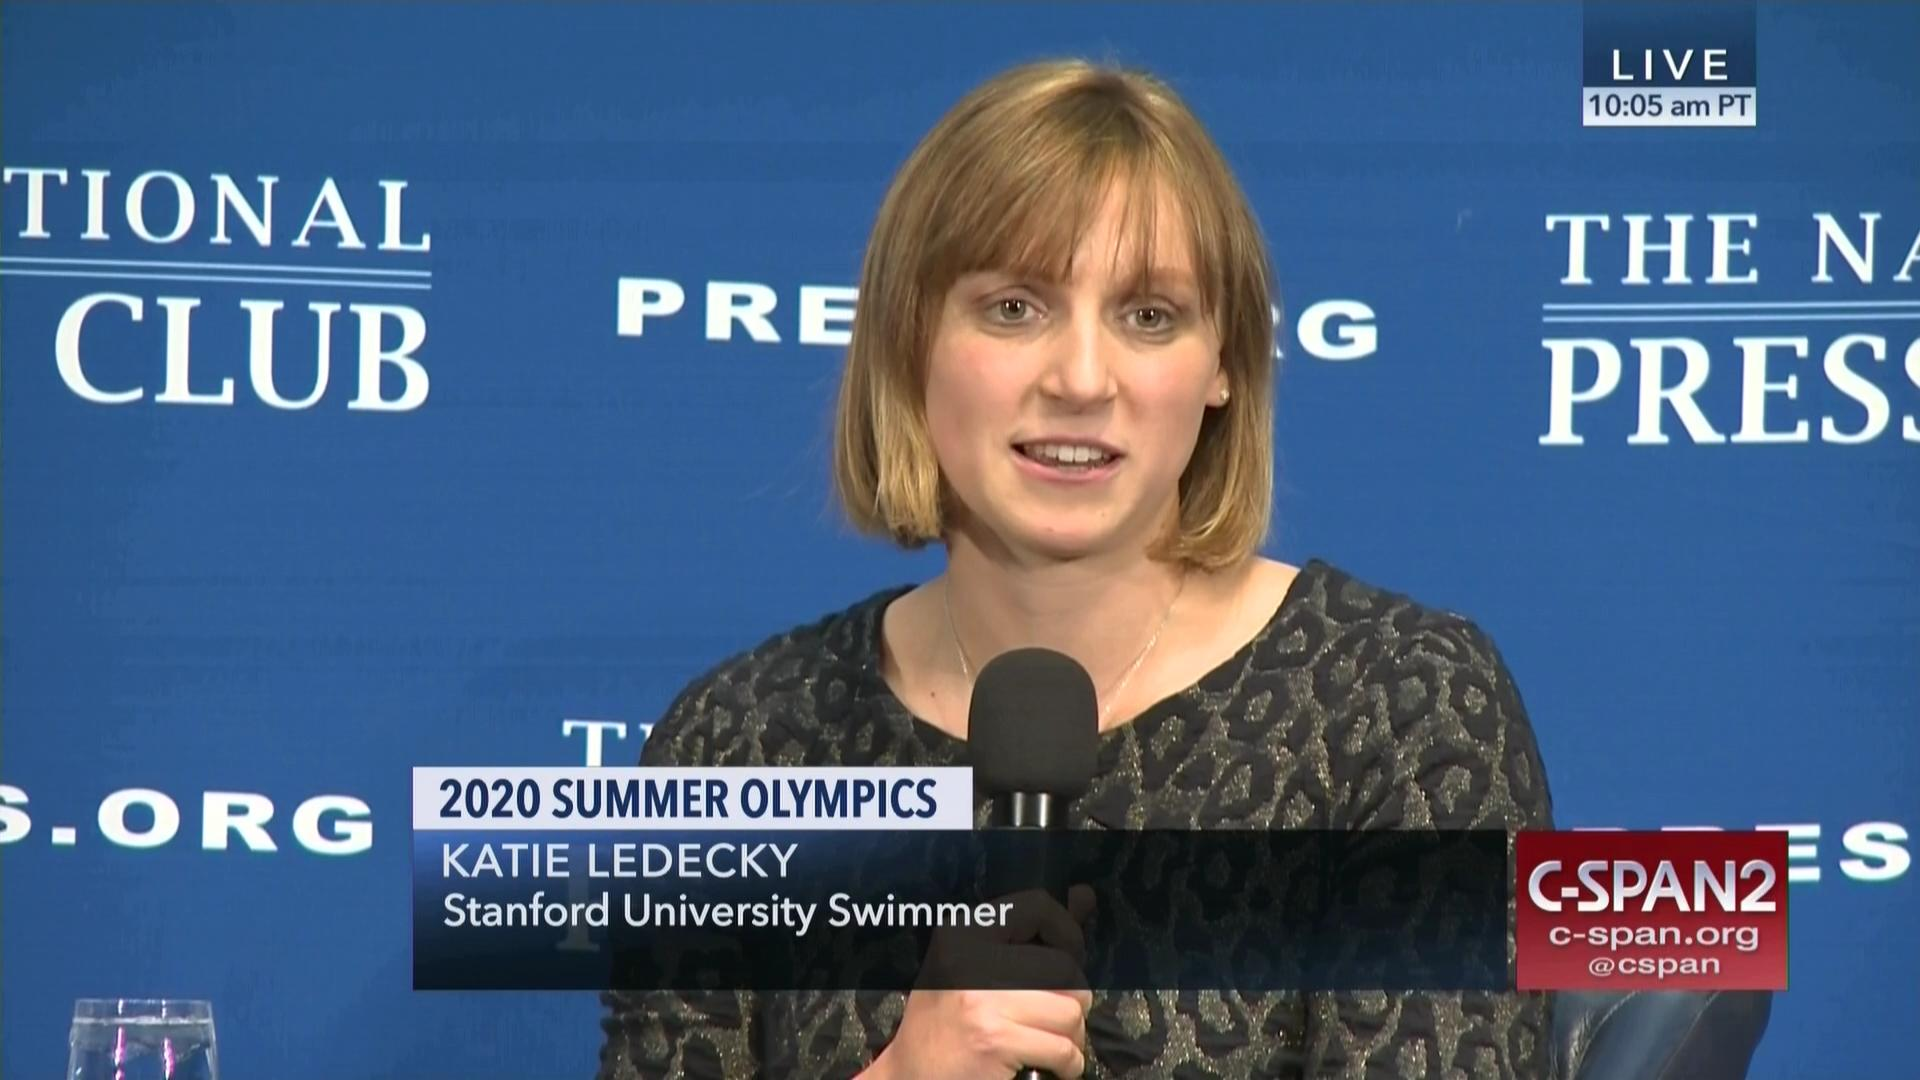 Katie Ledecky on the 2020 Summer Olympics